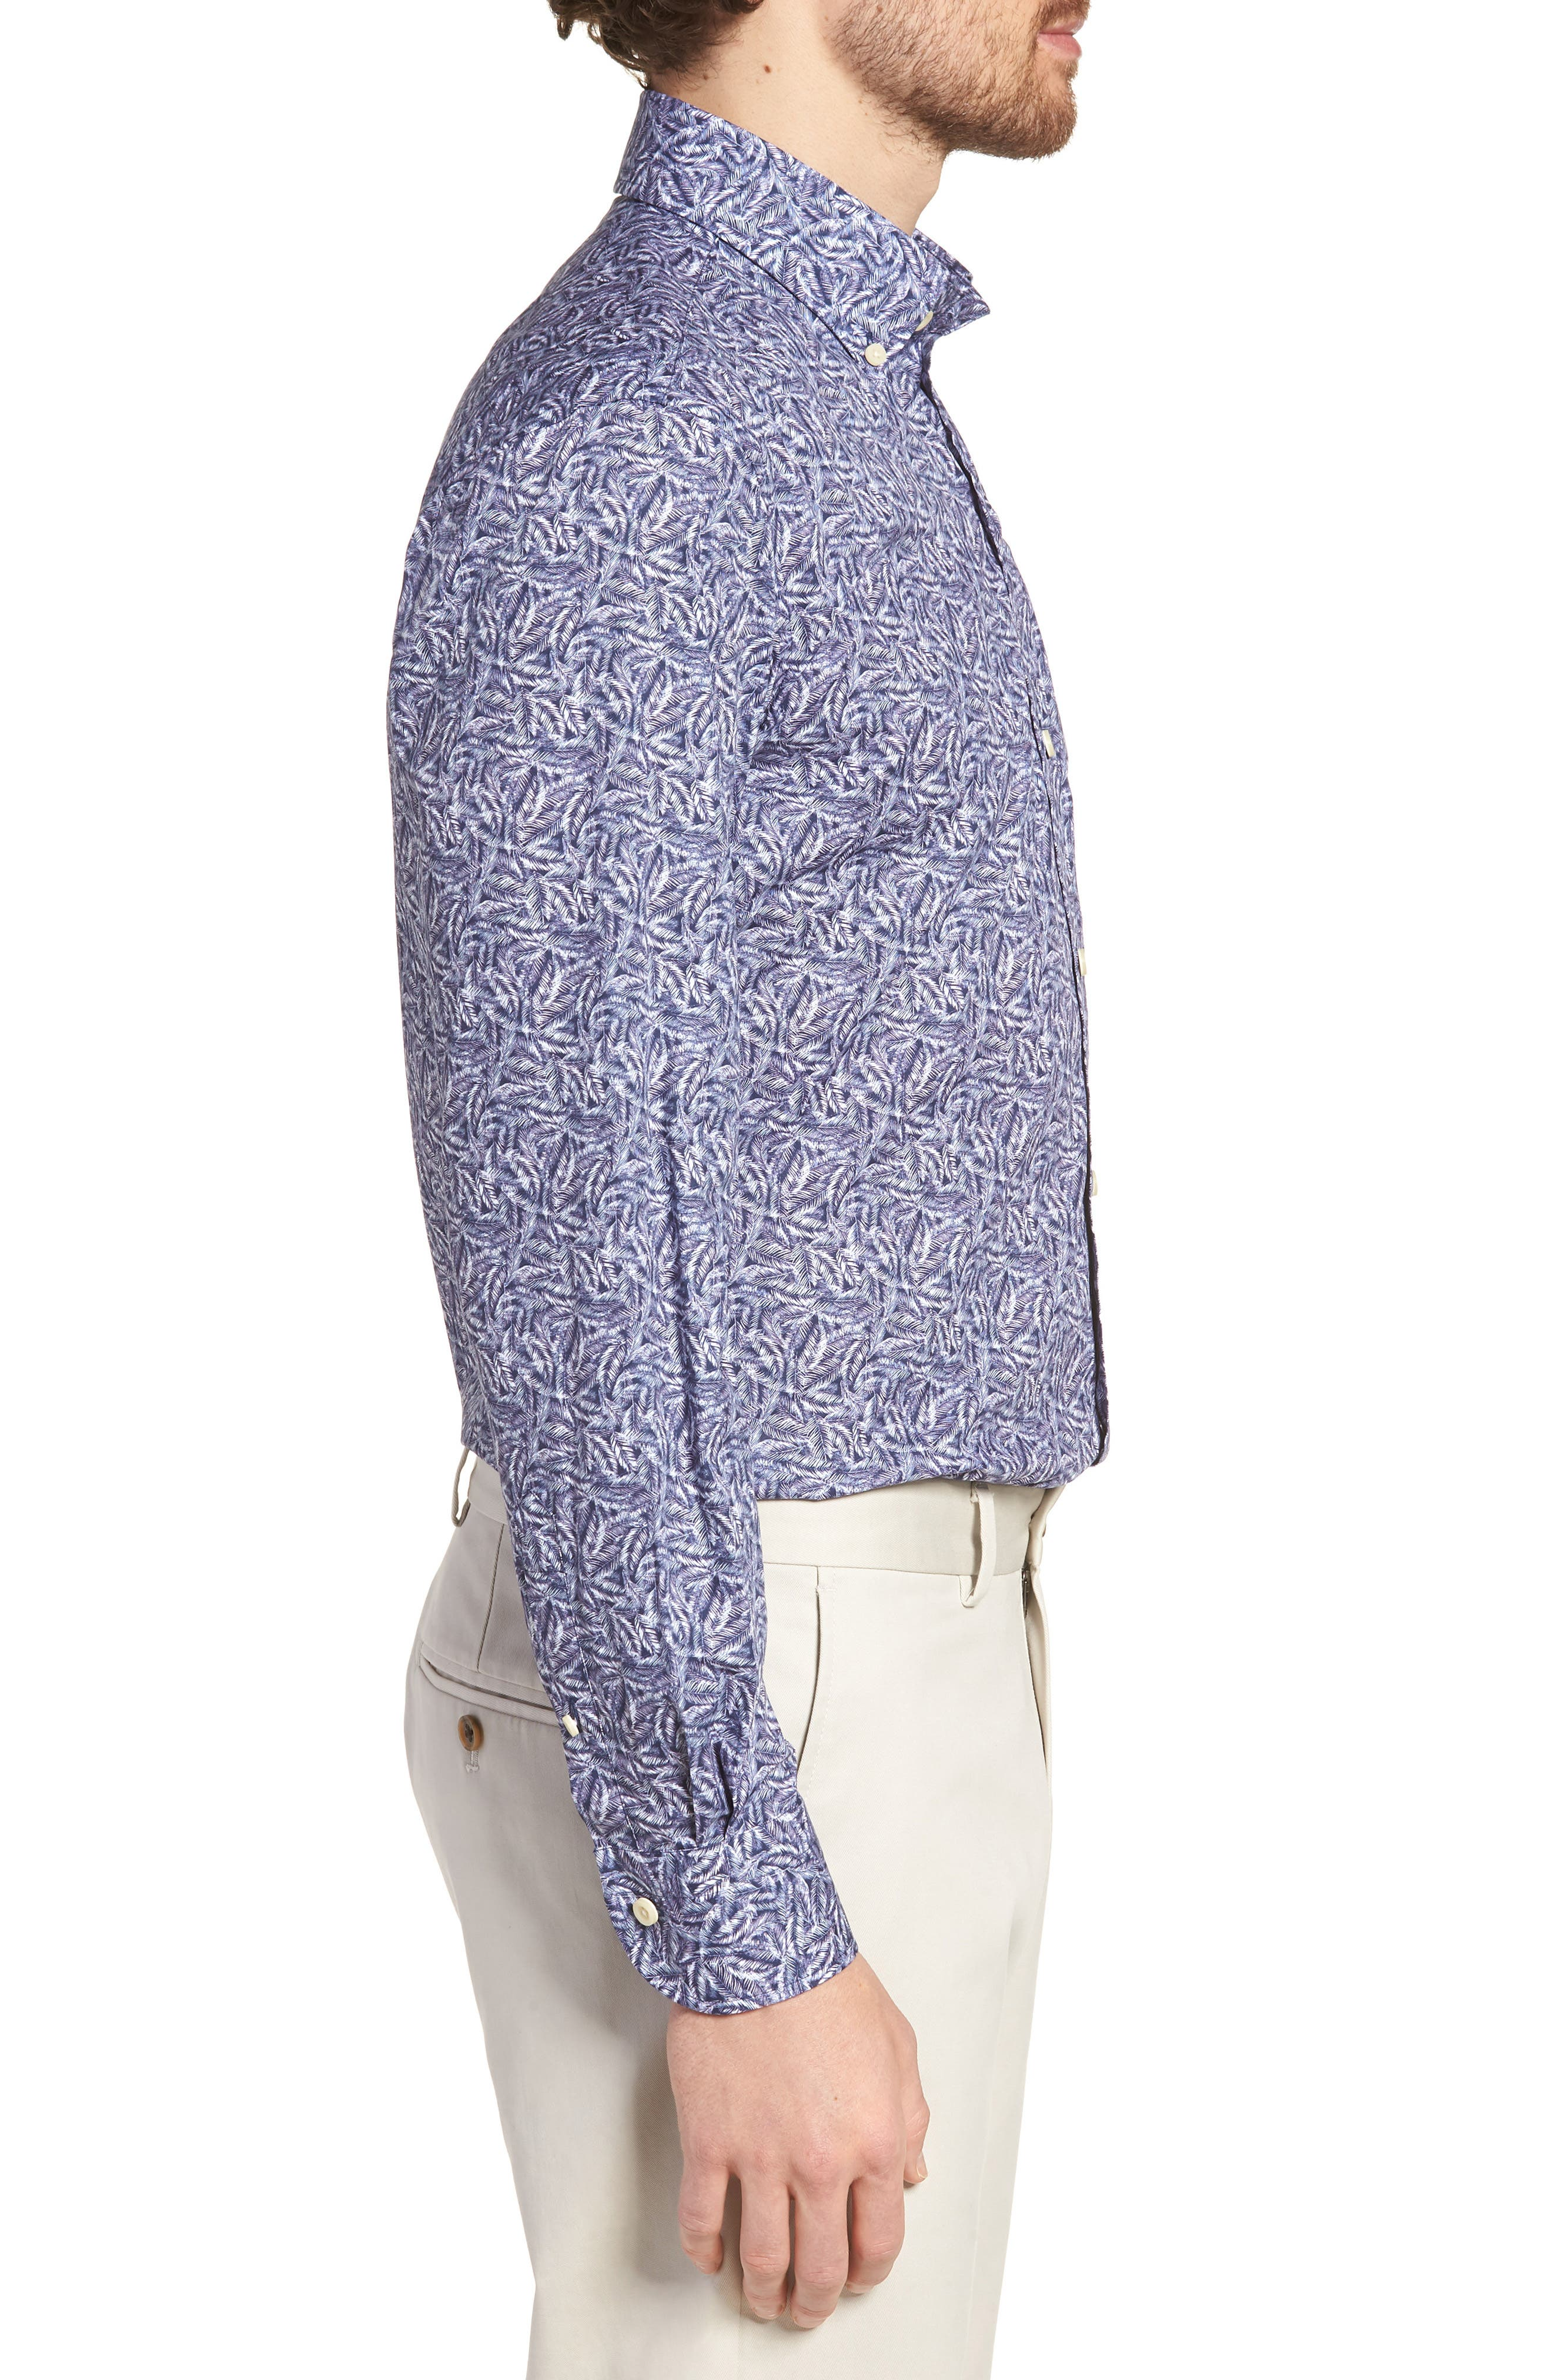 Garnaby Slim Fit Print Dress Shirt,                             Alternate thumbnail 4, color,                             400